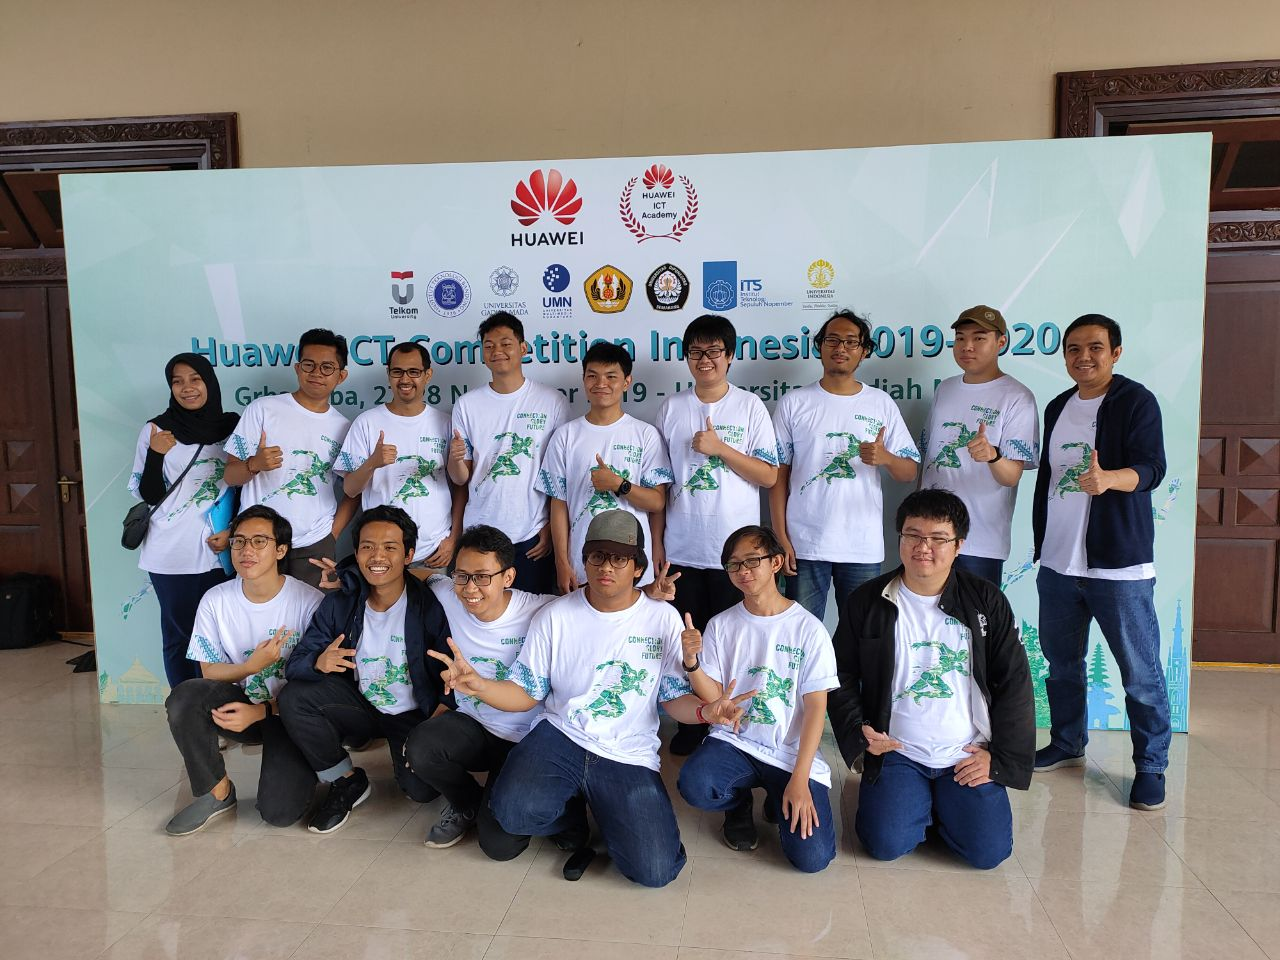 juara-tingkat-asia-pasifik-itb-lolos-ke-babak-final-huawei-ict-competition-tingkat-dunia